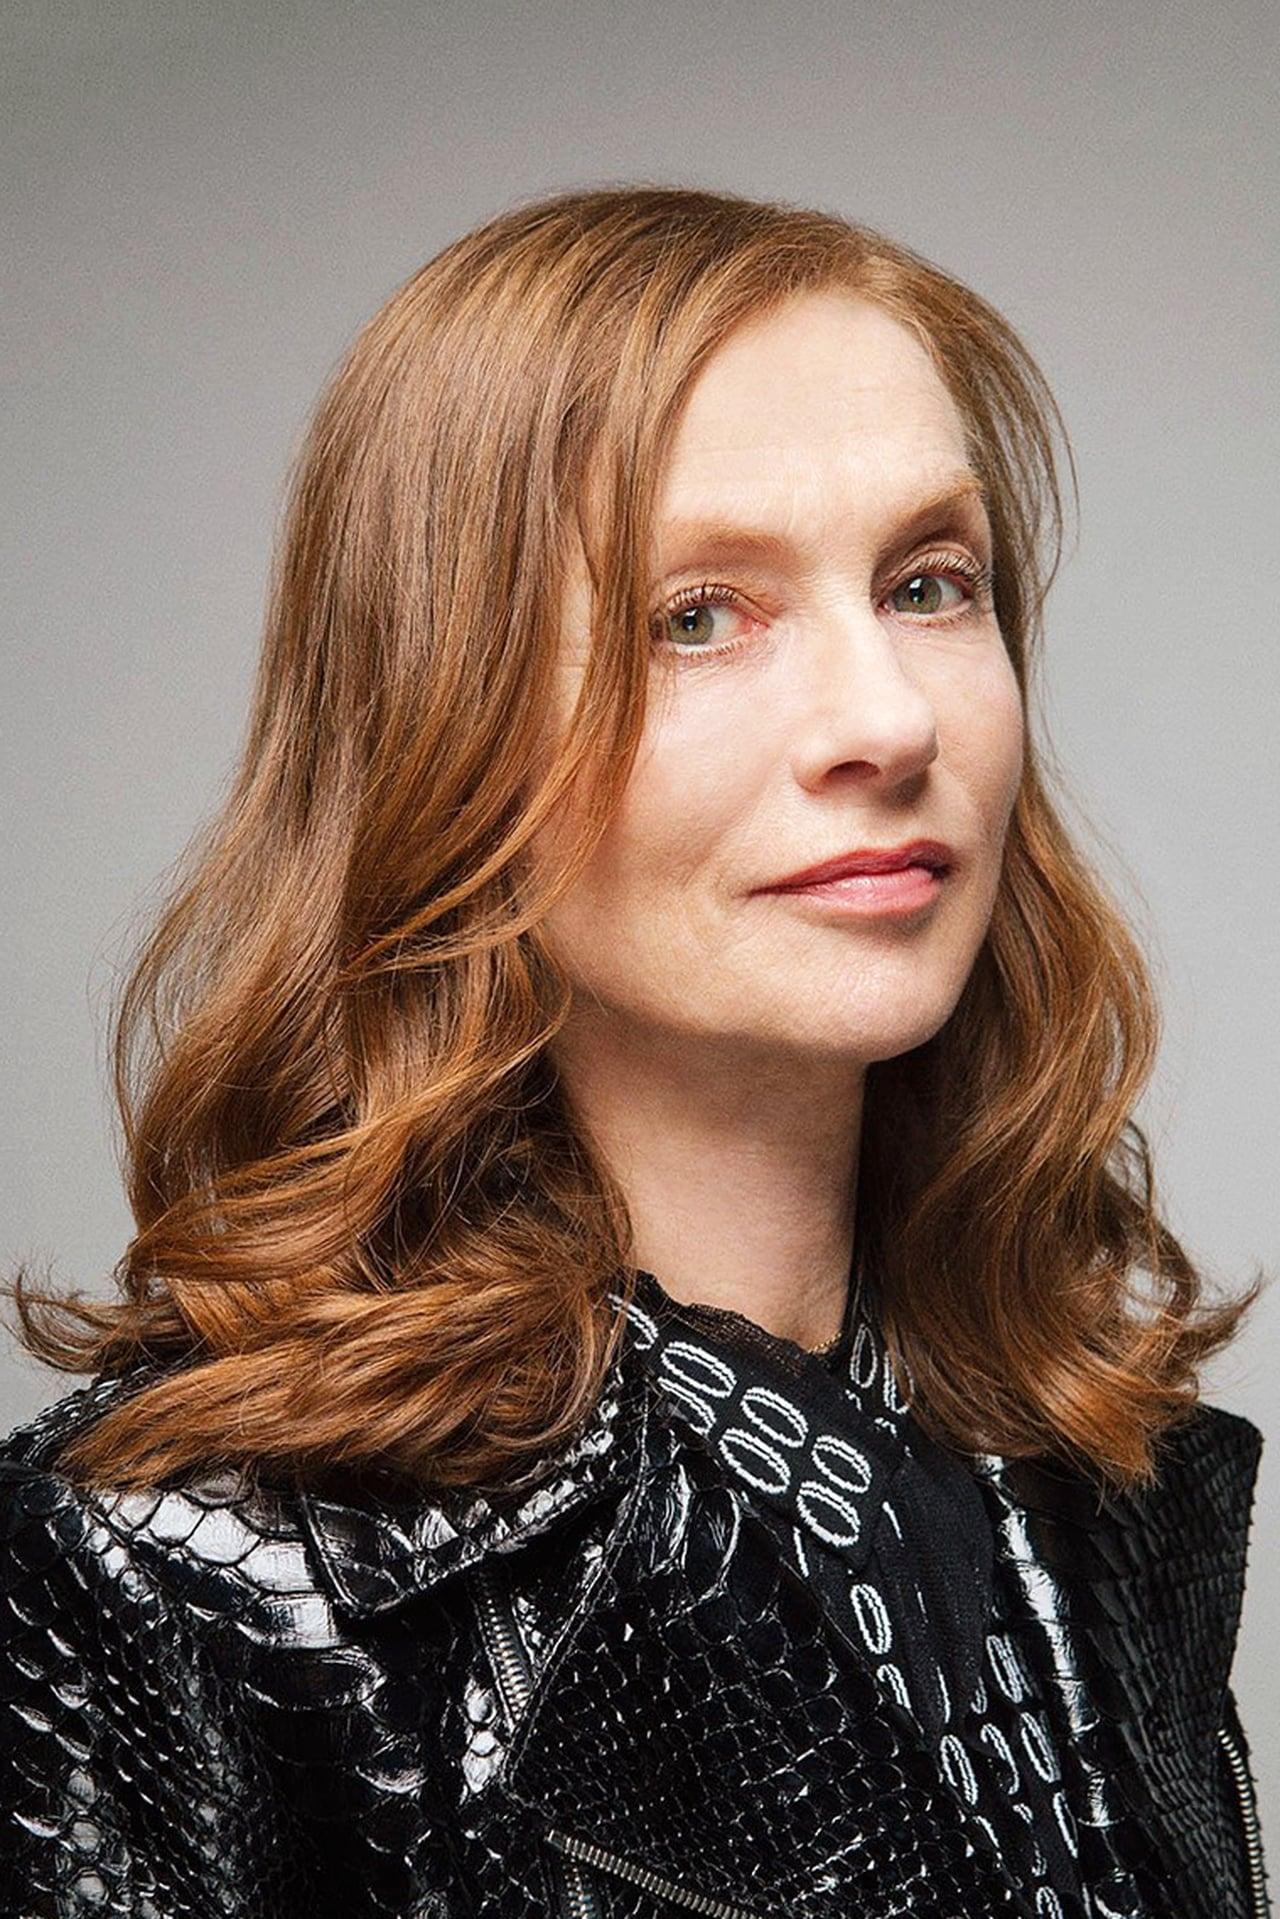 Isabelle Huppert isMichèle Leblanc